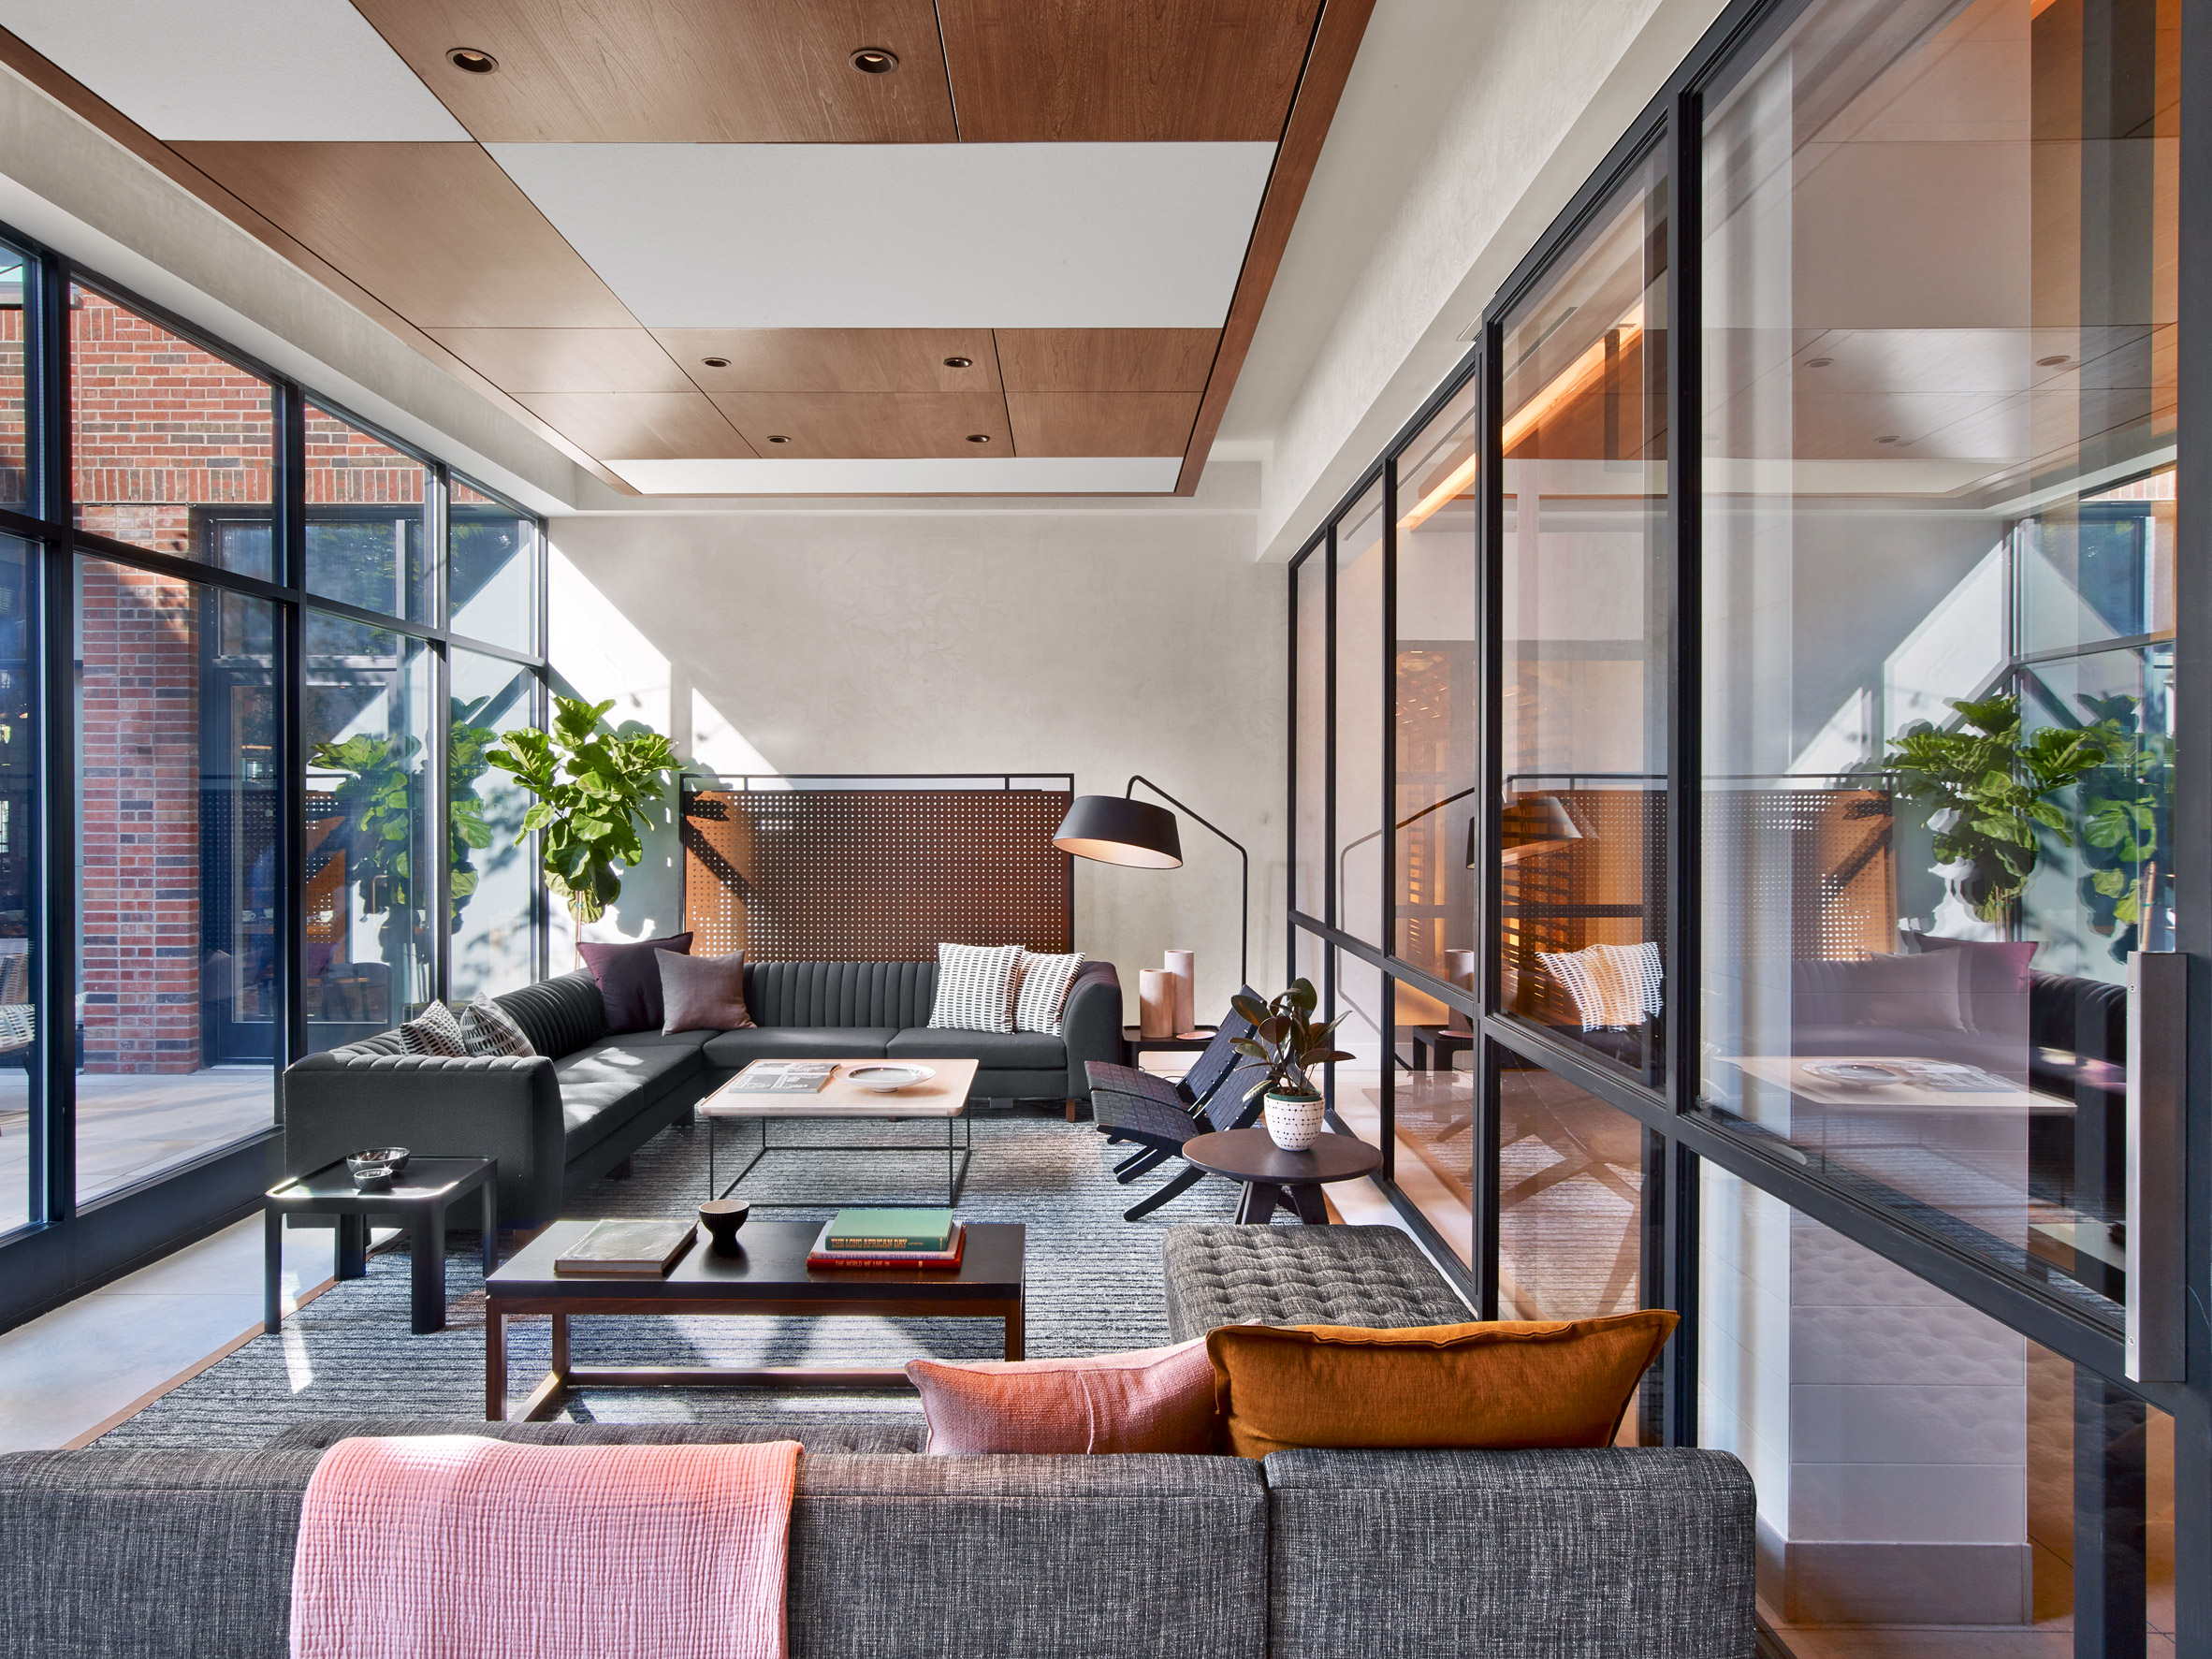 architecture-new-york-city-micro-hotel-design-studia-interiors-osnovadesign-osnova-poltava_09